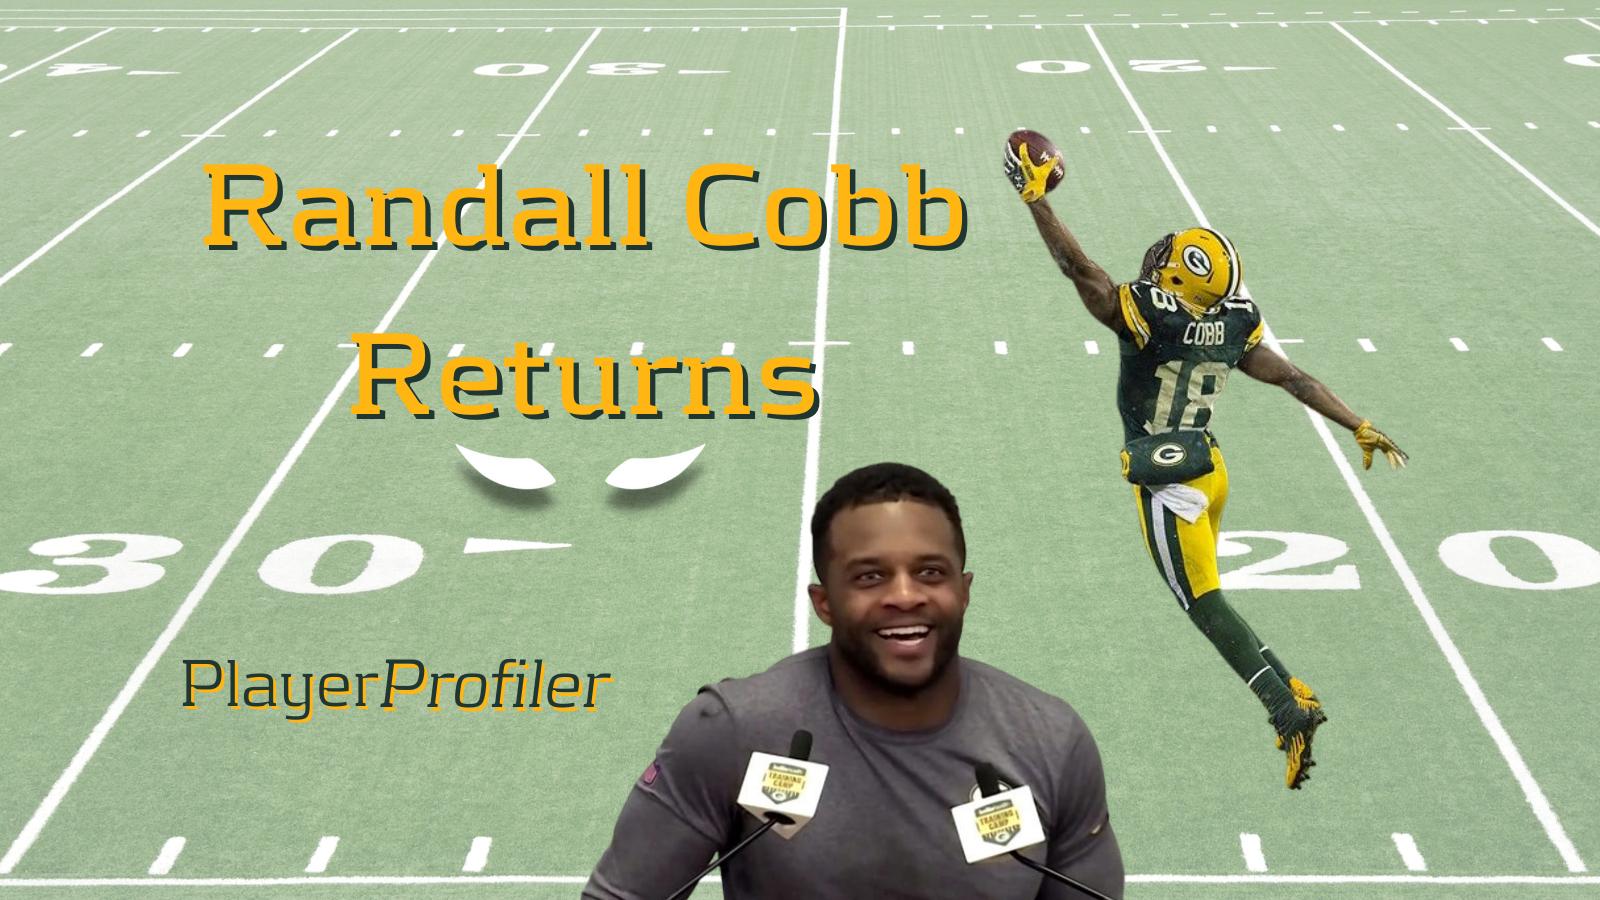 randall-cobb-fantasy-football